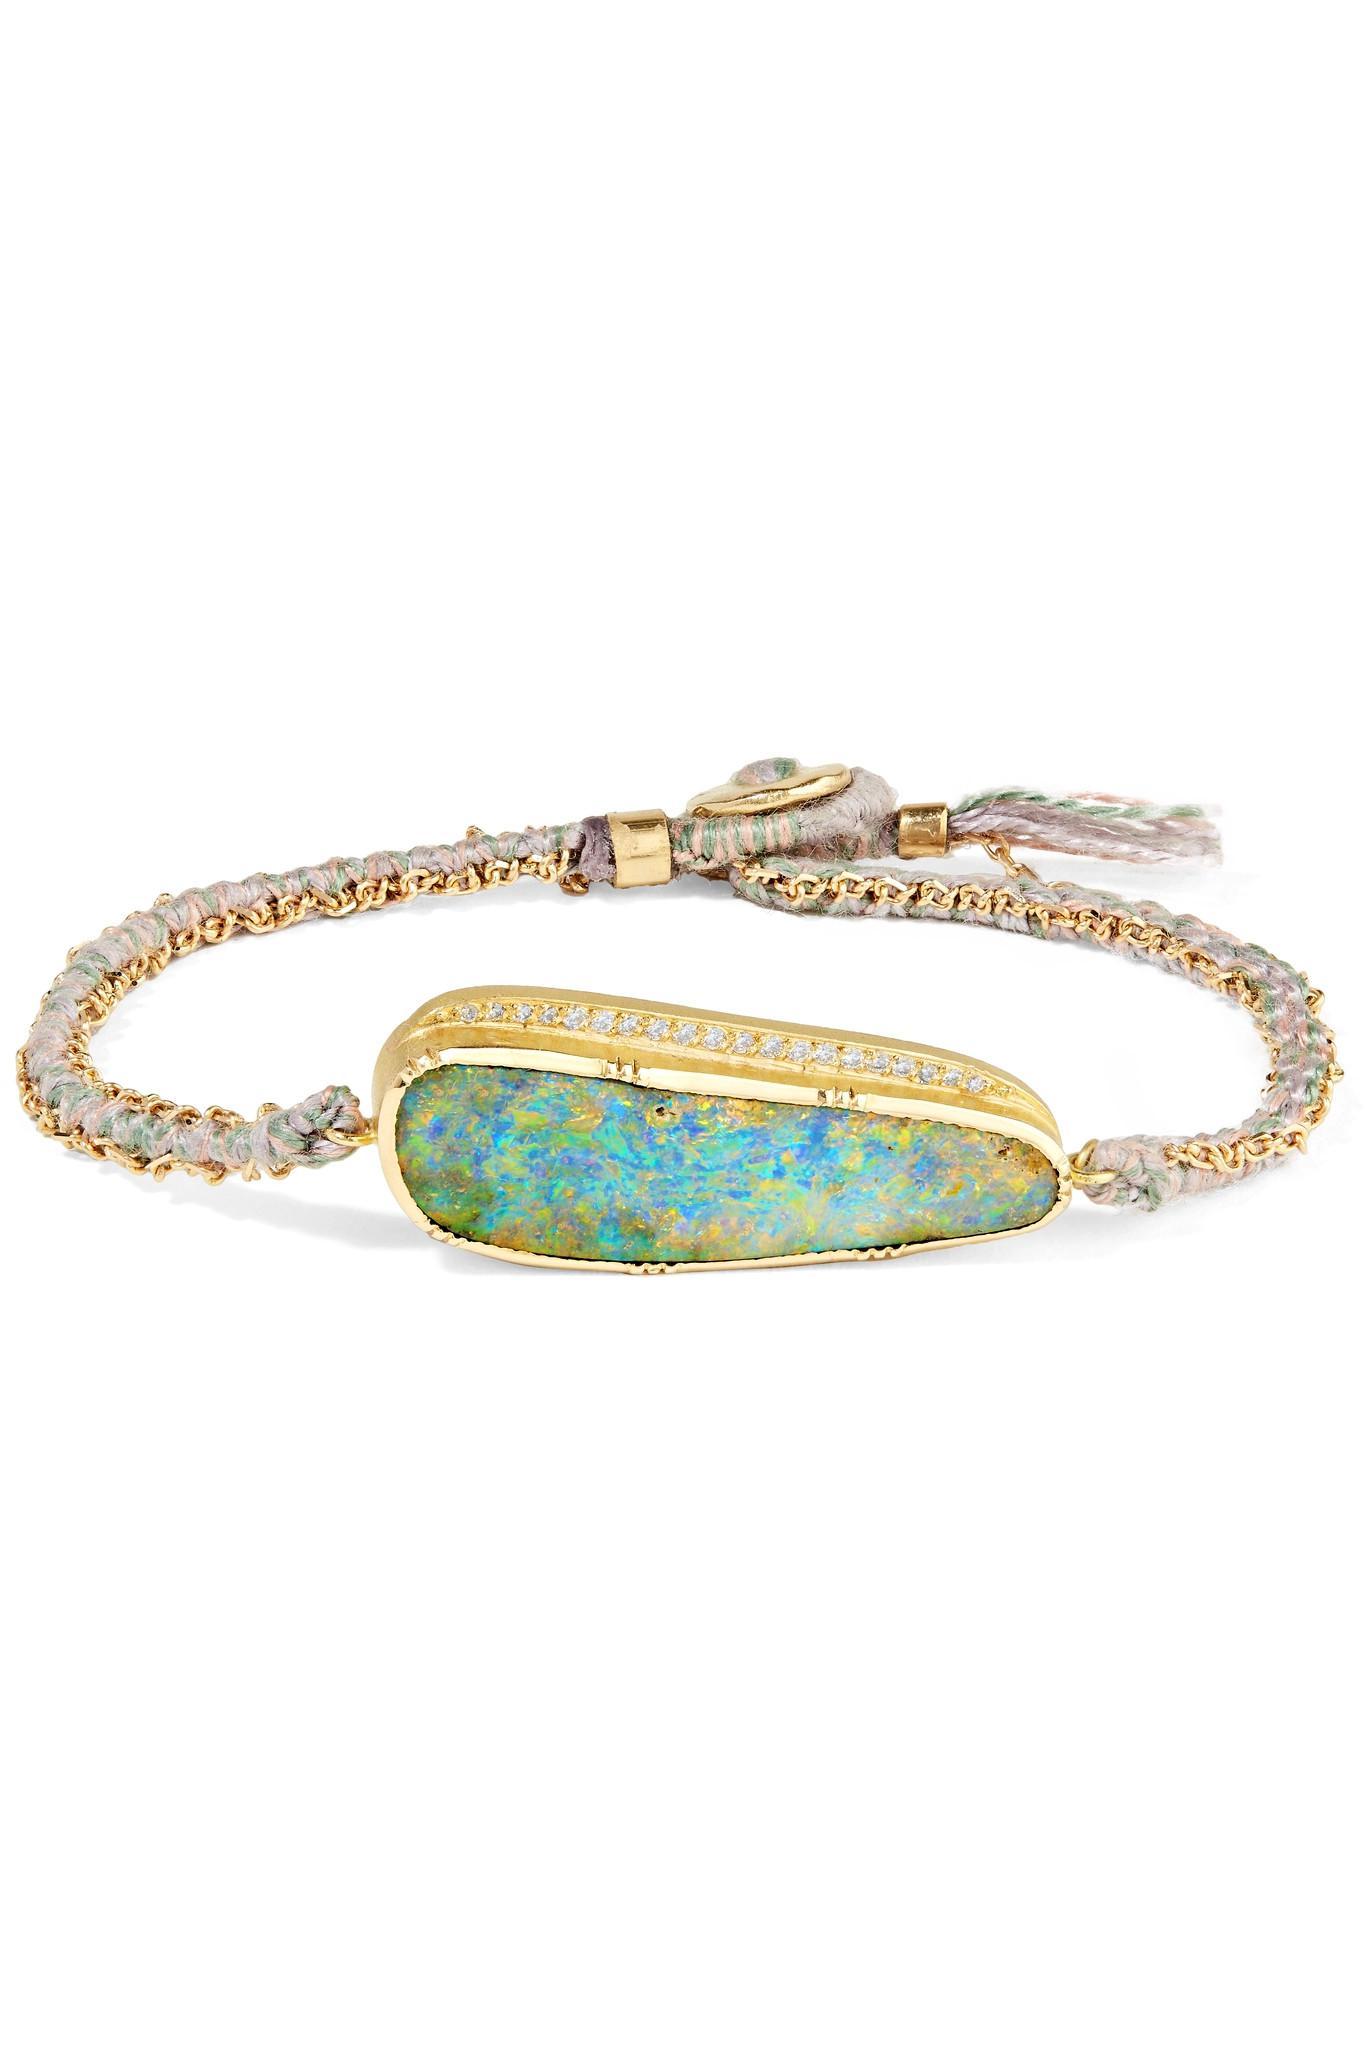 Gemco Designs 18kt gold, diamond, opal & sapphire hand bracelet - Metallic